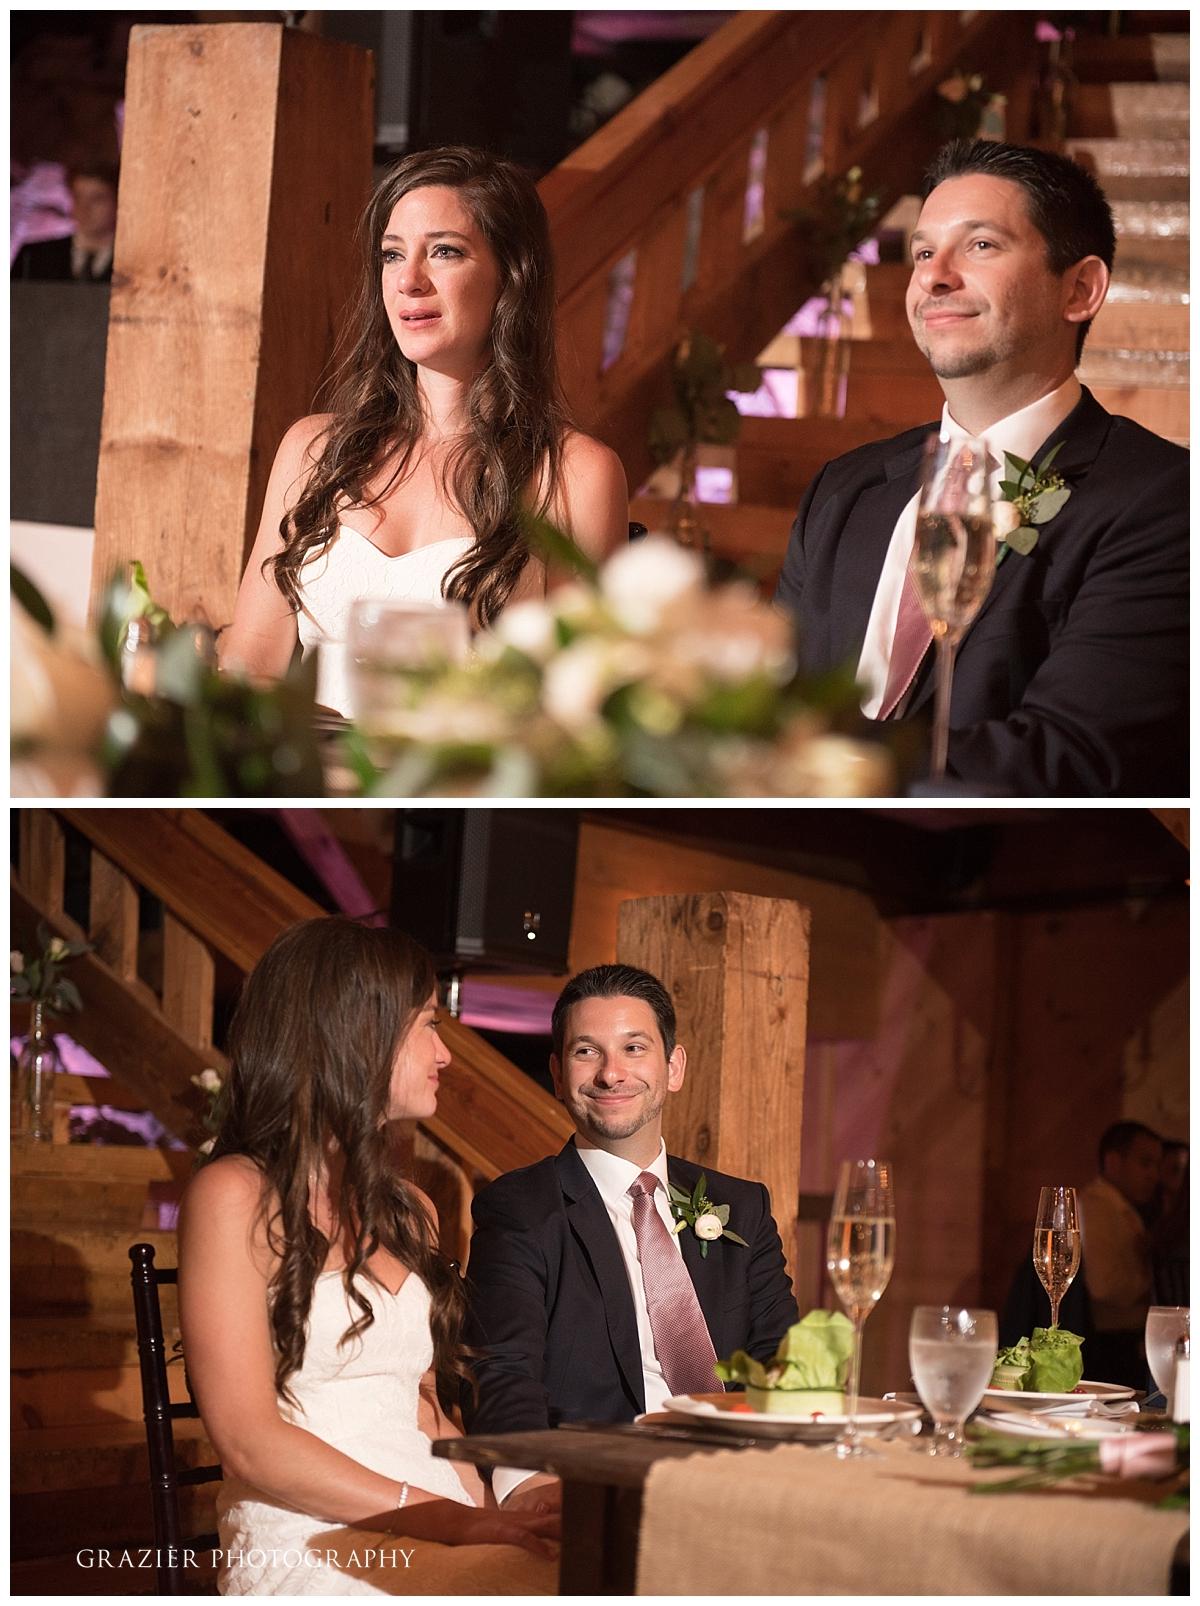 The Red Lion Inn Wedding Grazier Photography 170826-93_WEB.jpg